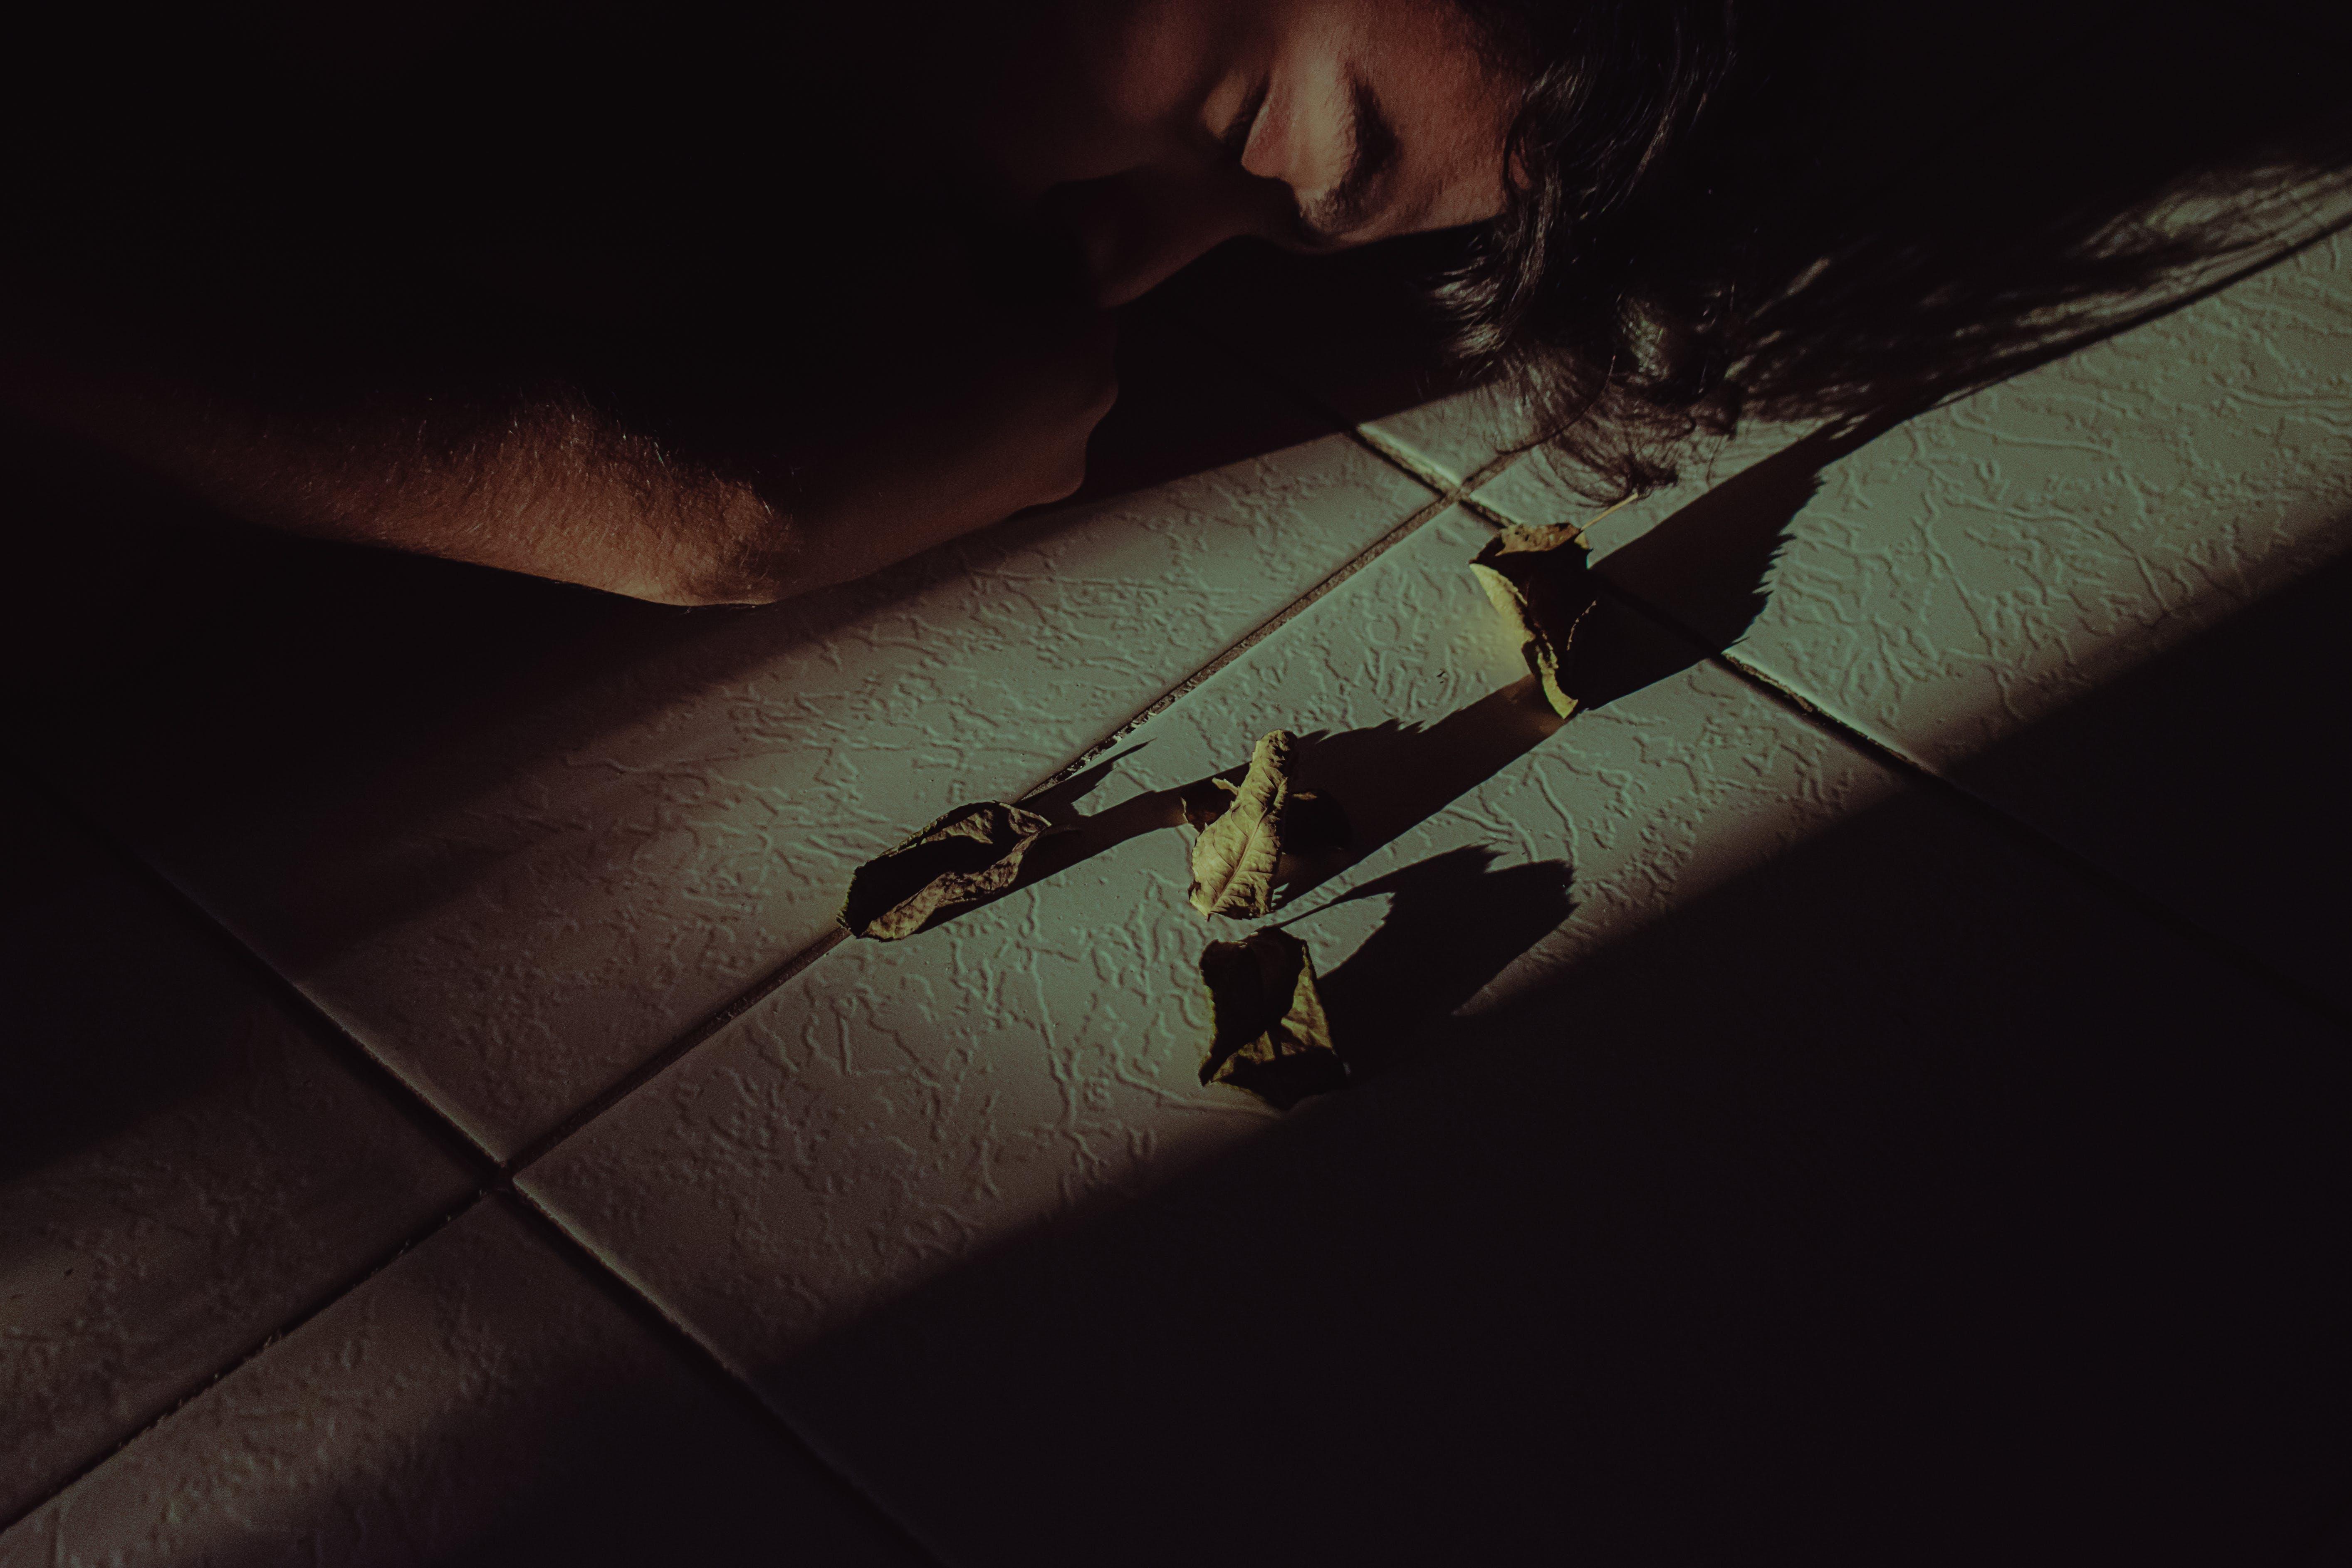 Person Sleeping Beside Dead Leaves